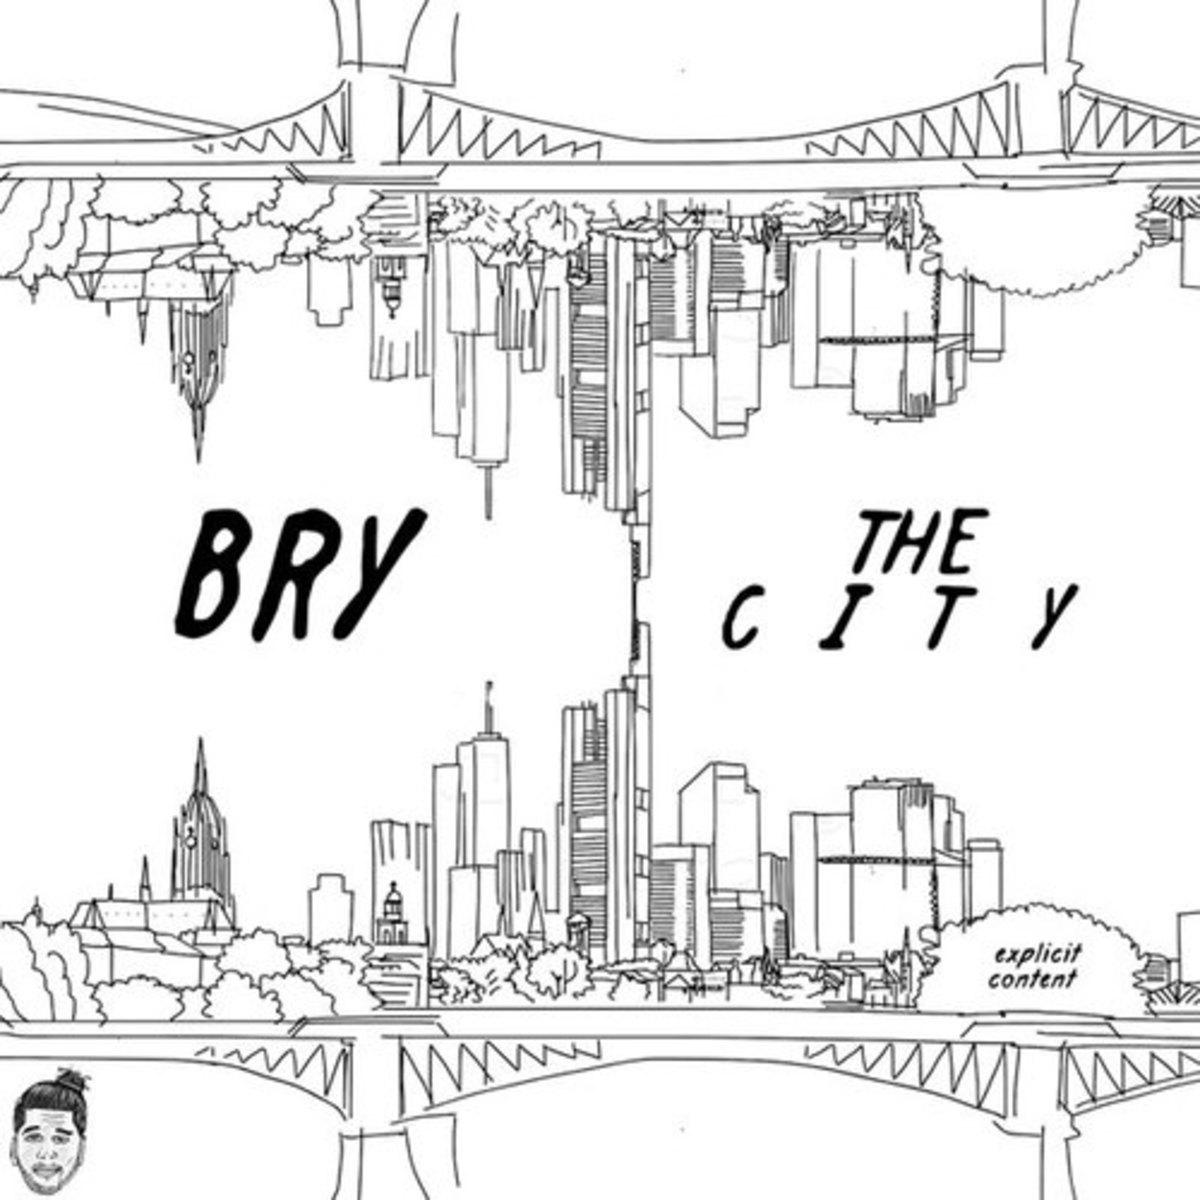 bry-the-city.jpg